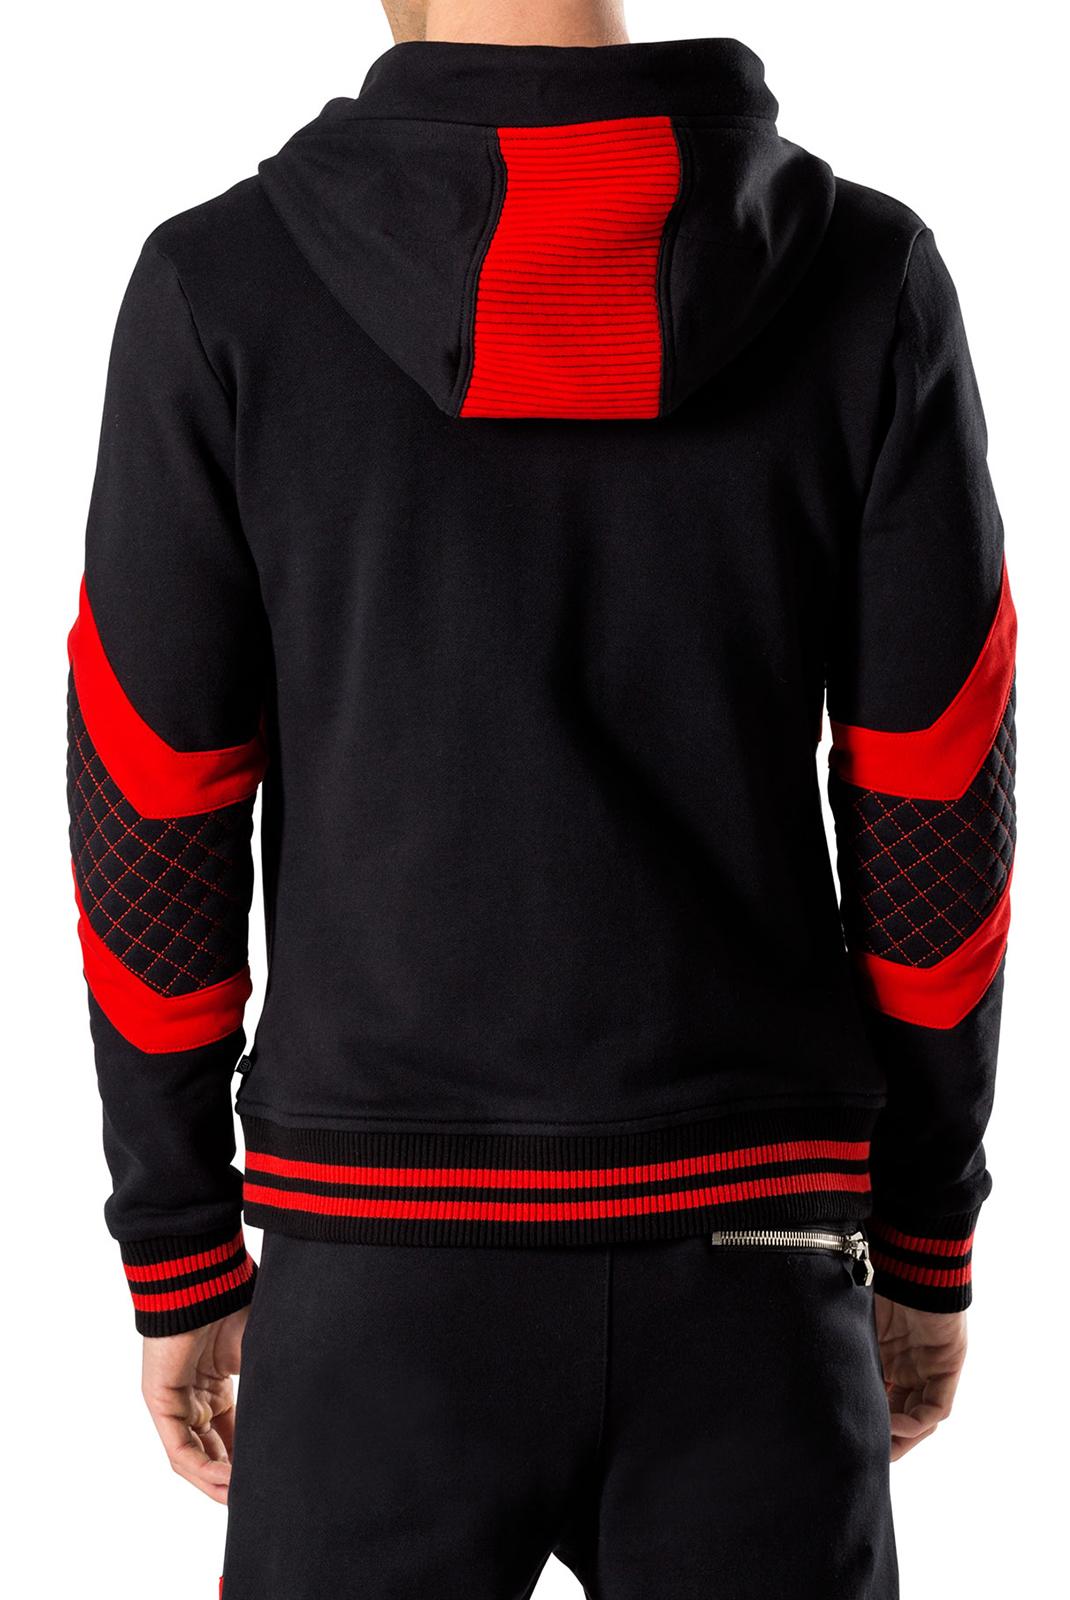 Vestes zippées  Philipp plein MJO0030 SO ONE 02R4 BLACK/RED